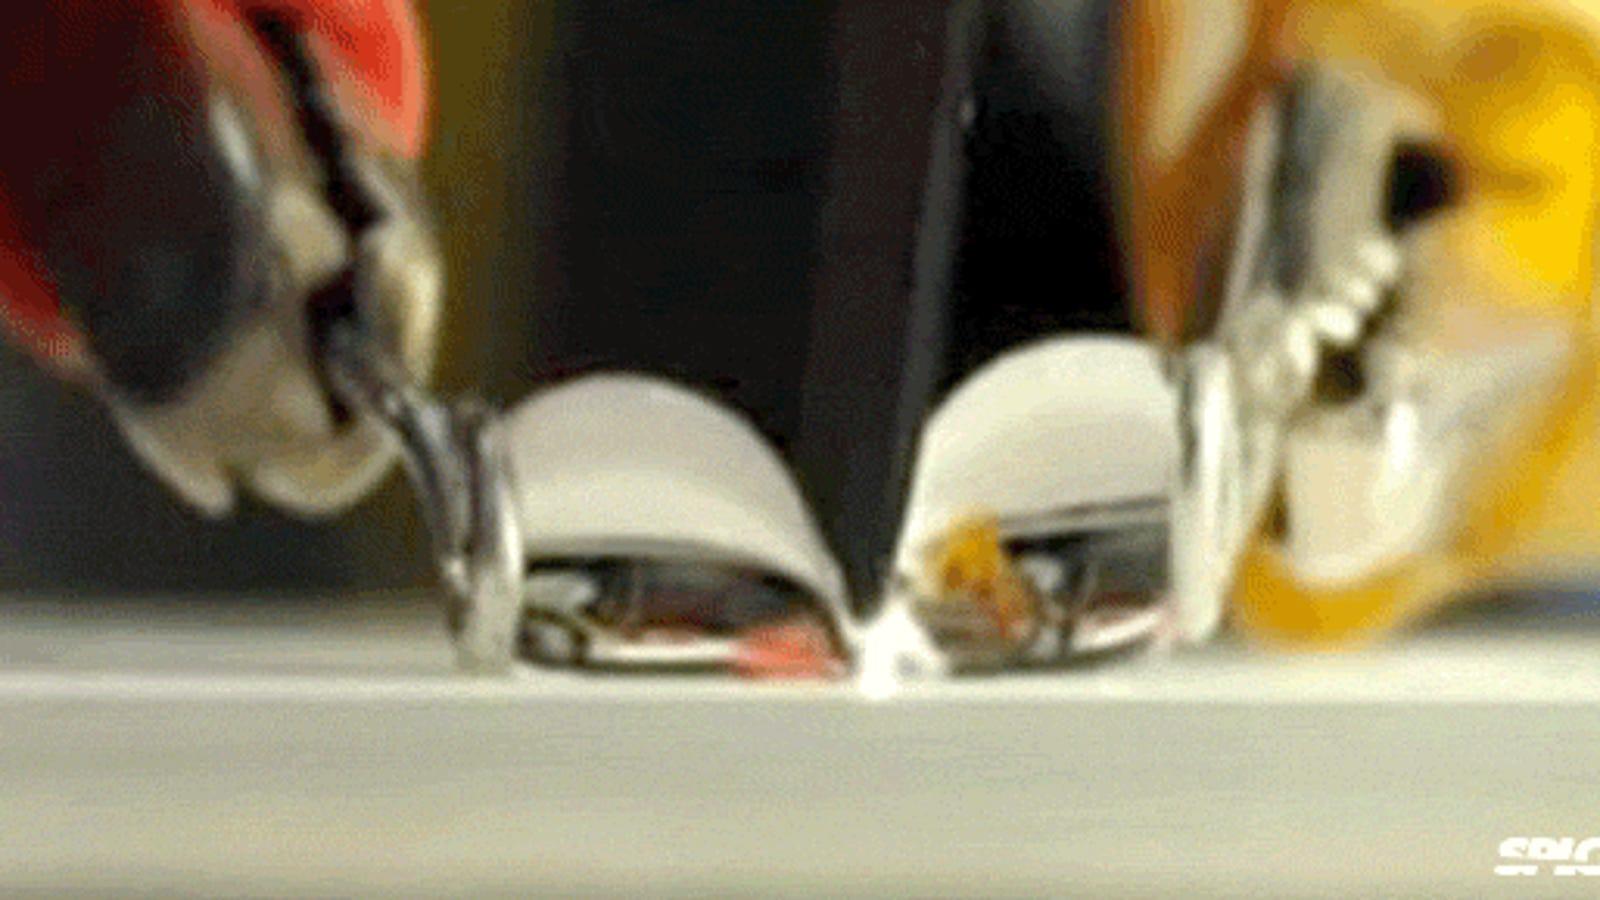 Watch a super hydrophobic knife cut through a water droplet